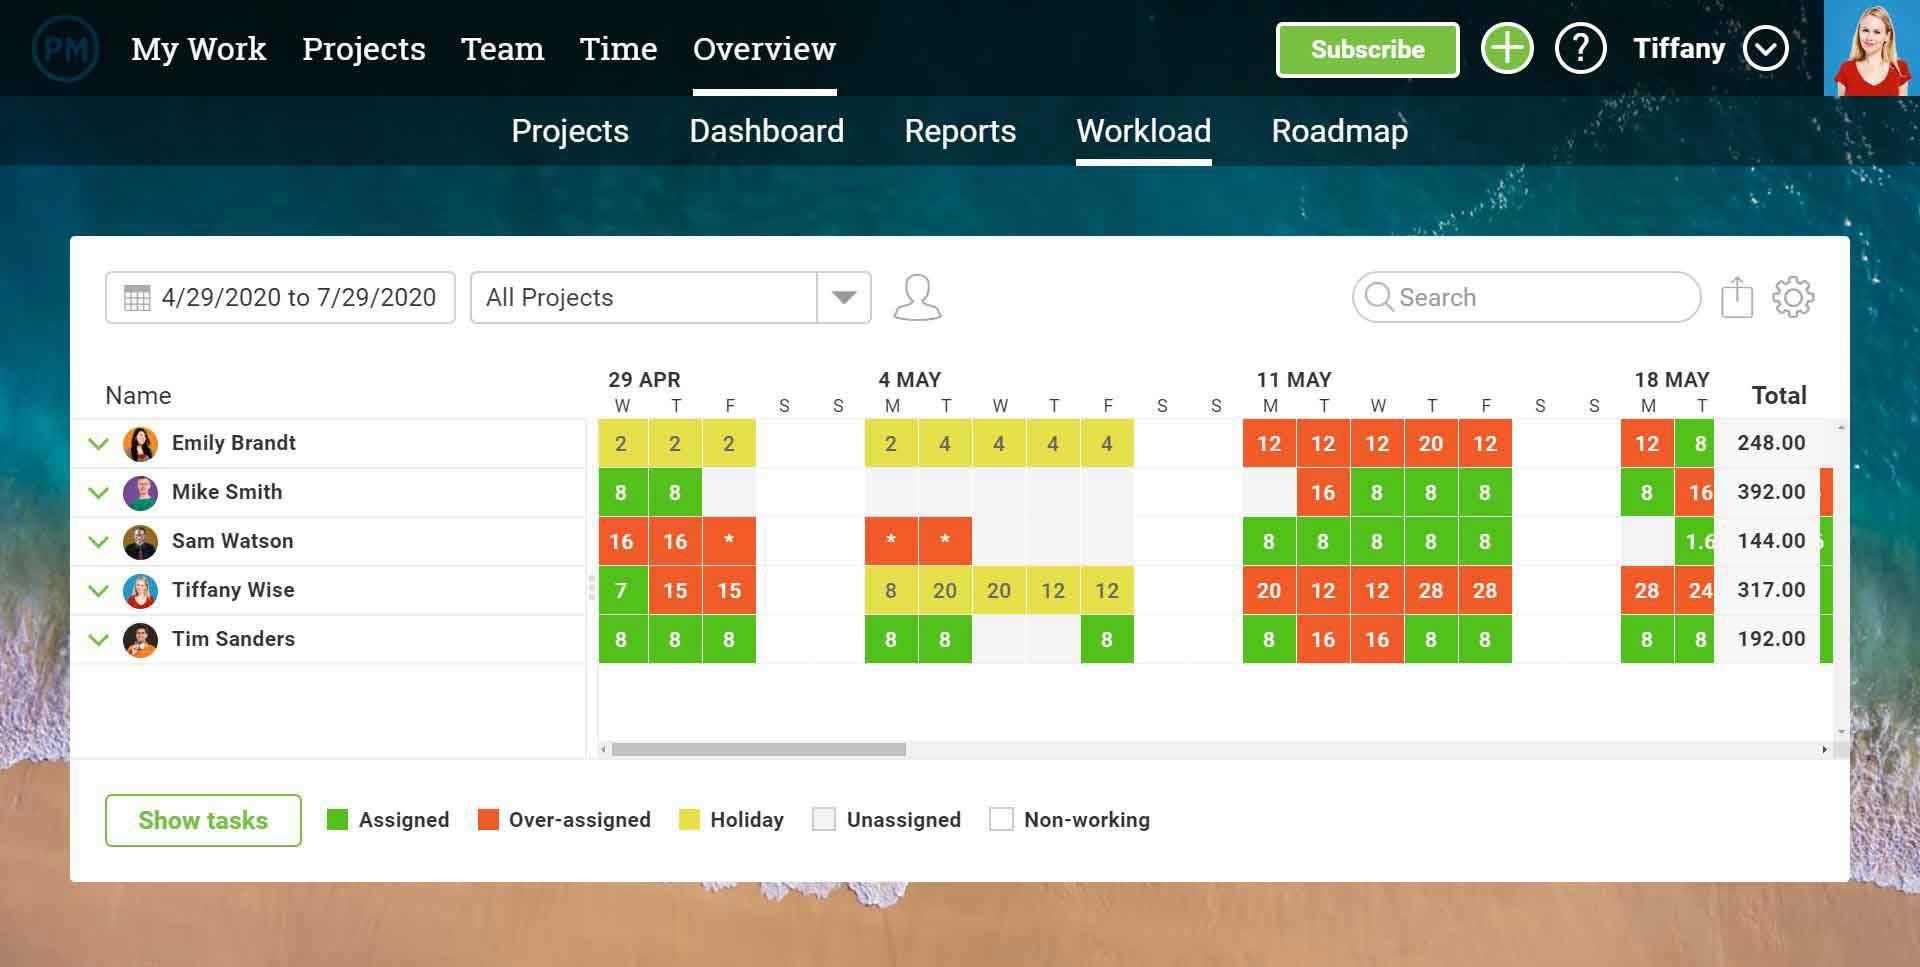 Una captura de pantalla de la página de carga de trabajo general en ProjectManager.com